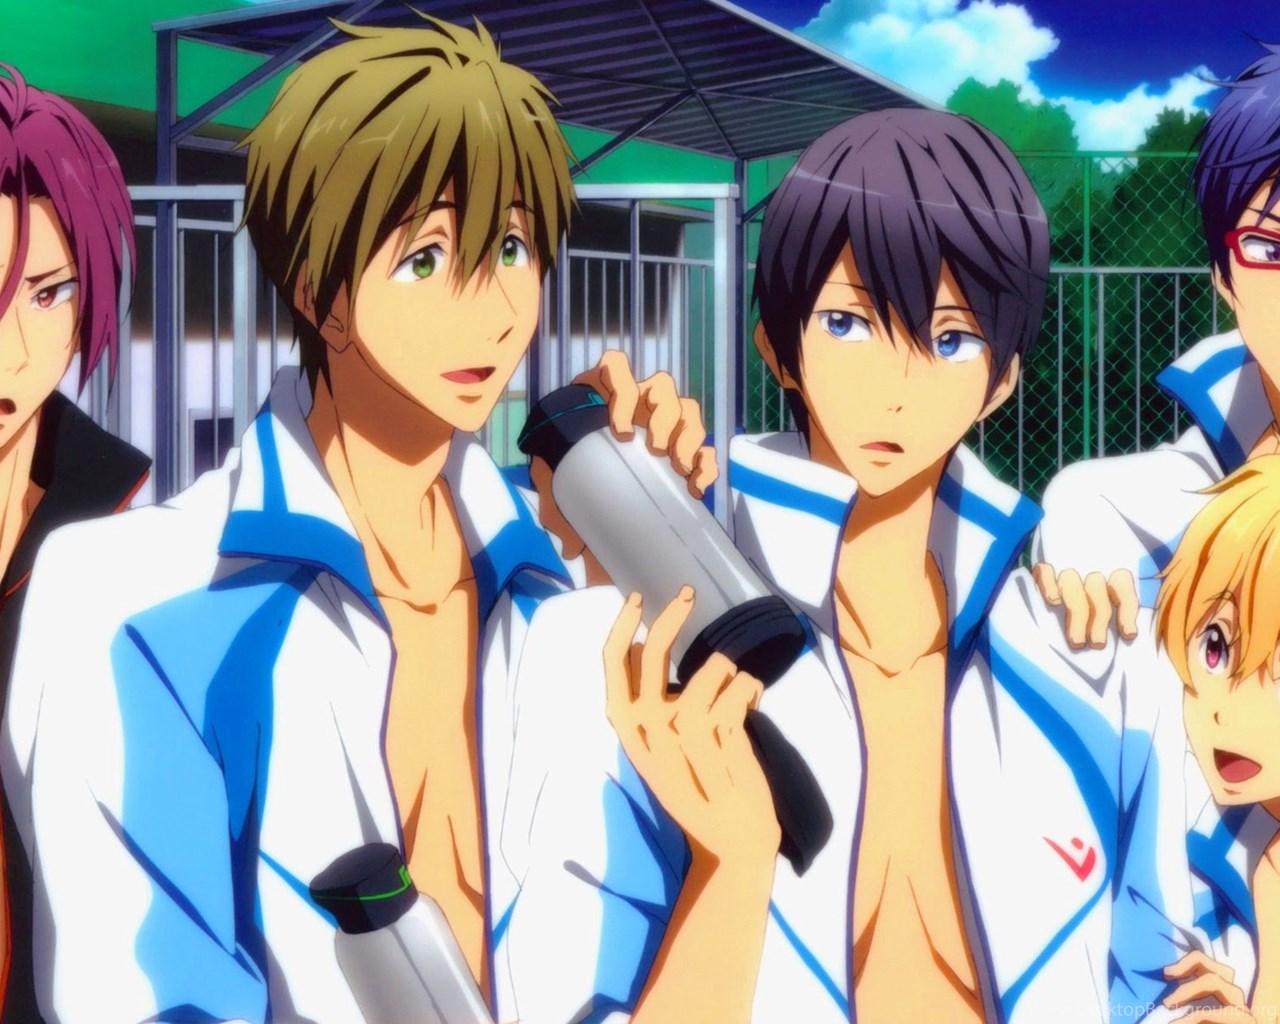 Free Iwatobi Swim Club Anime A87 Hd Wallpapers Desktop Background